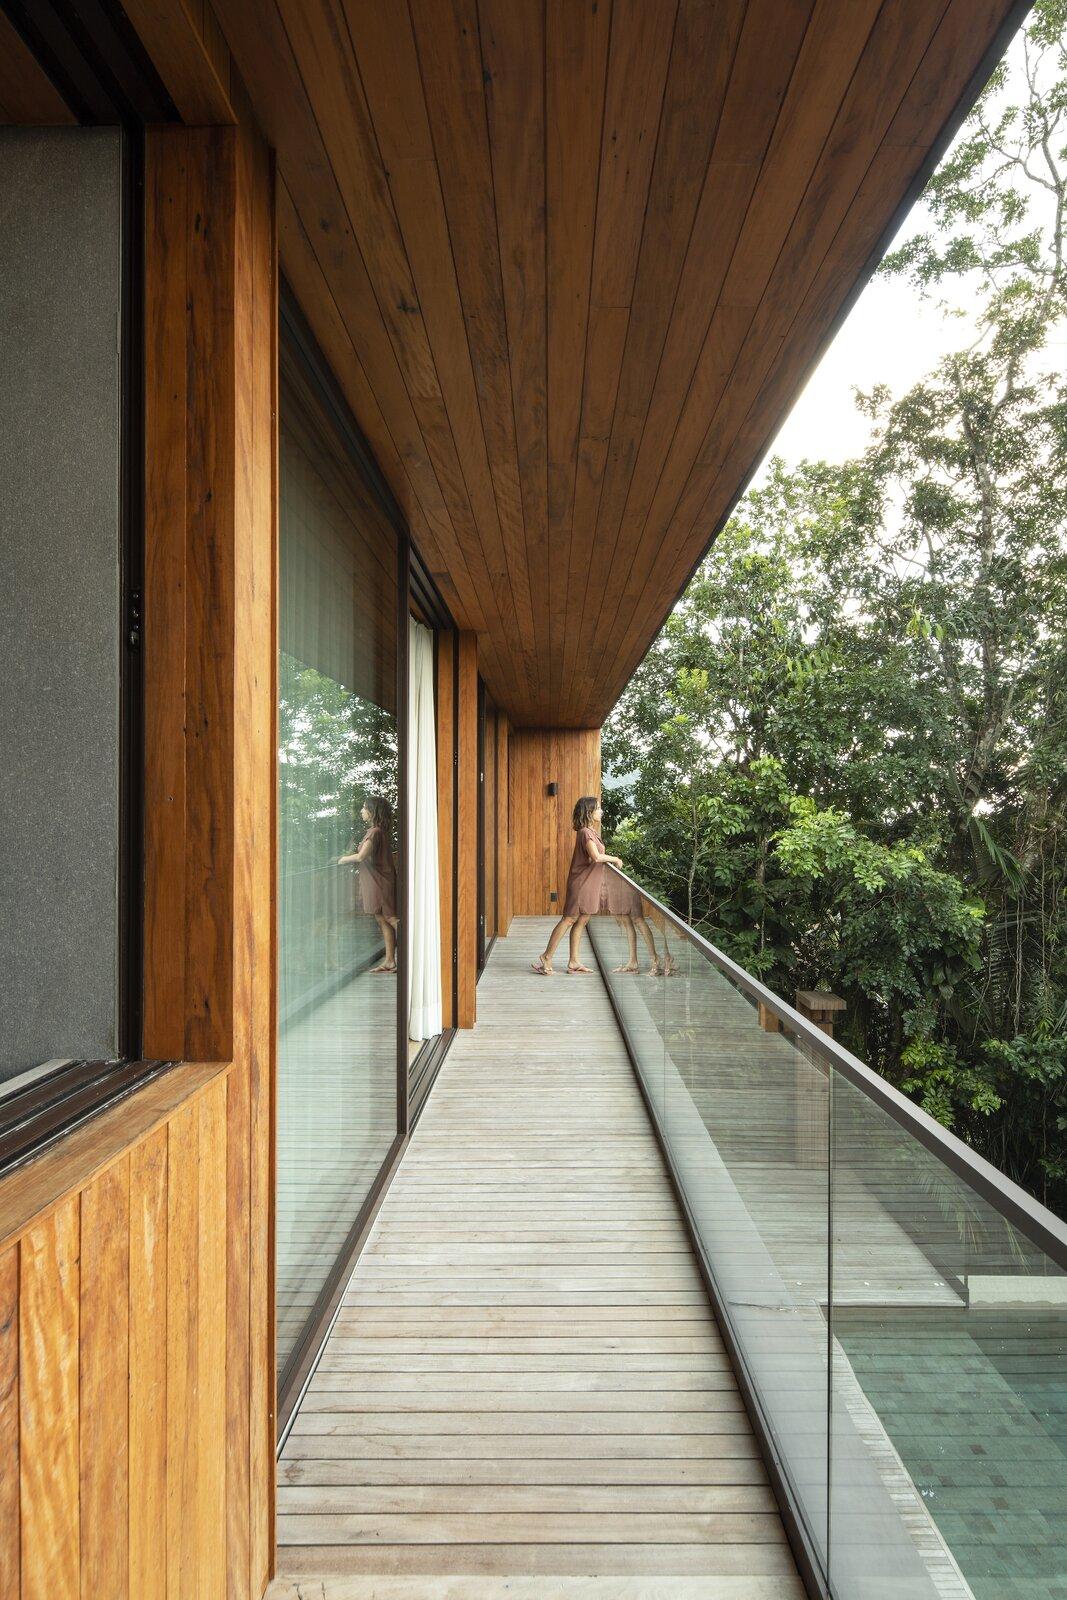 Balcony of Casa Iporanga by Daniel Fromer.